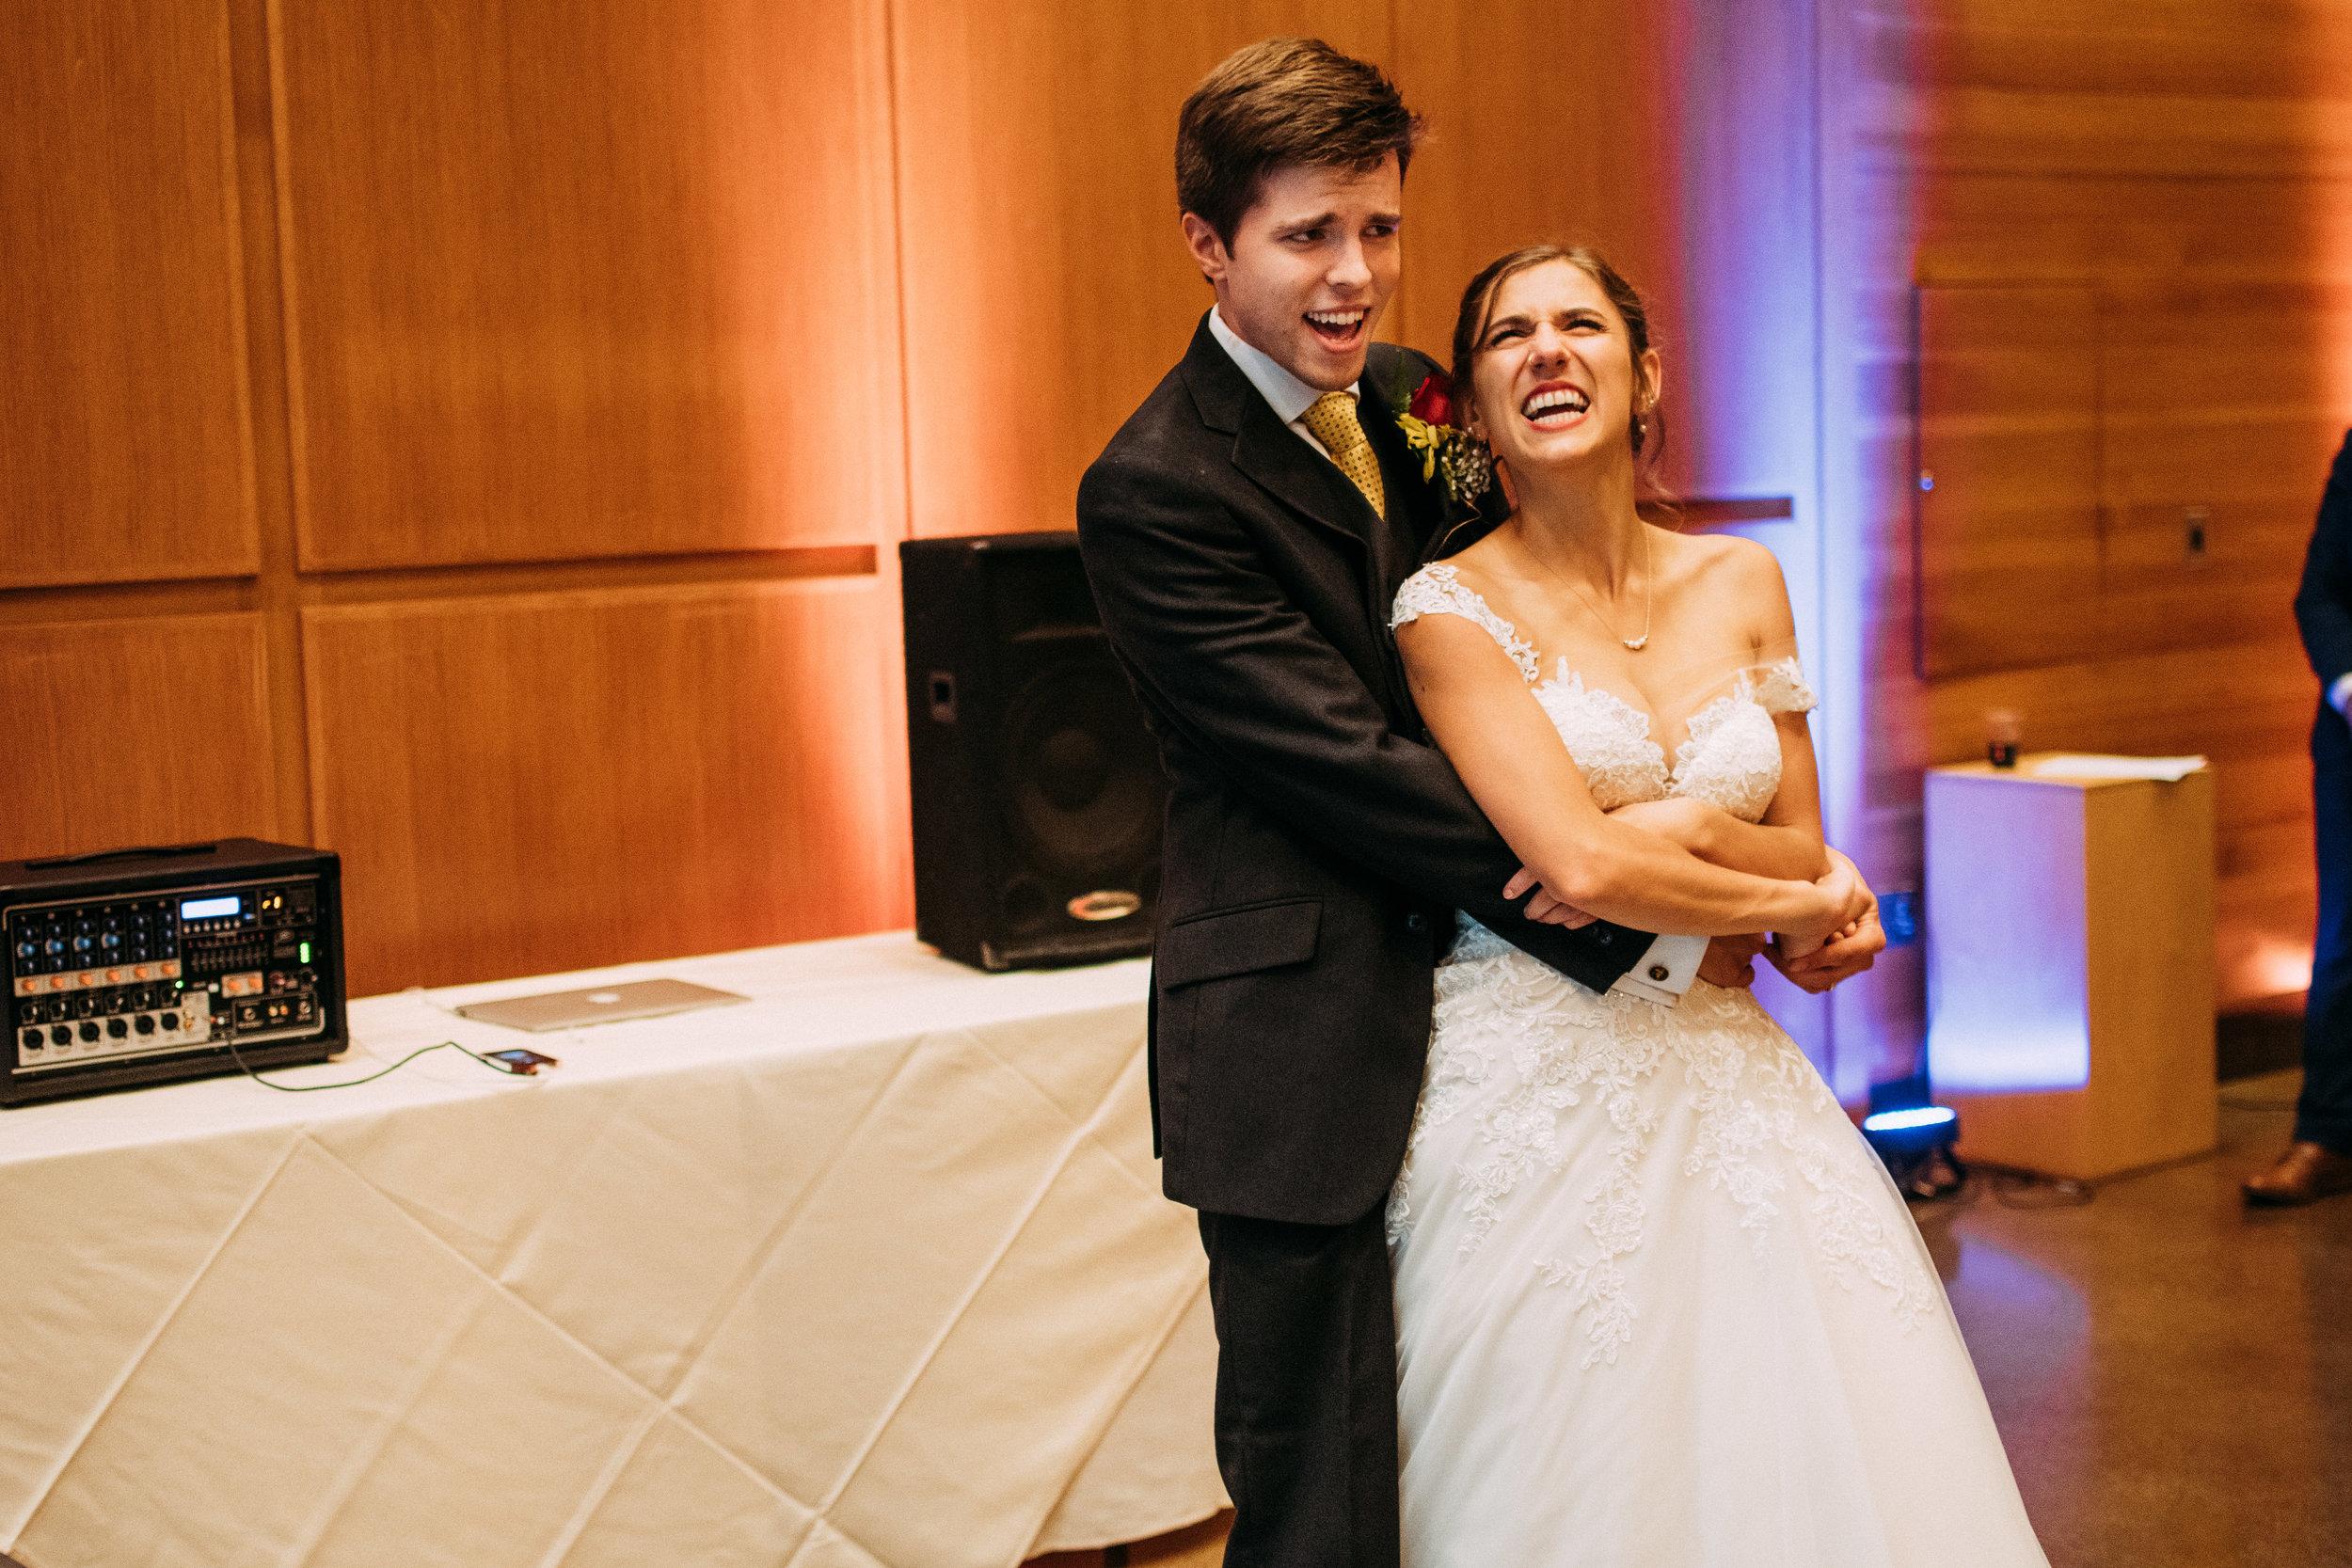 43-Liza_Chris_Minneapolis_Minnesota_Wedding.jpg